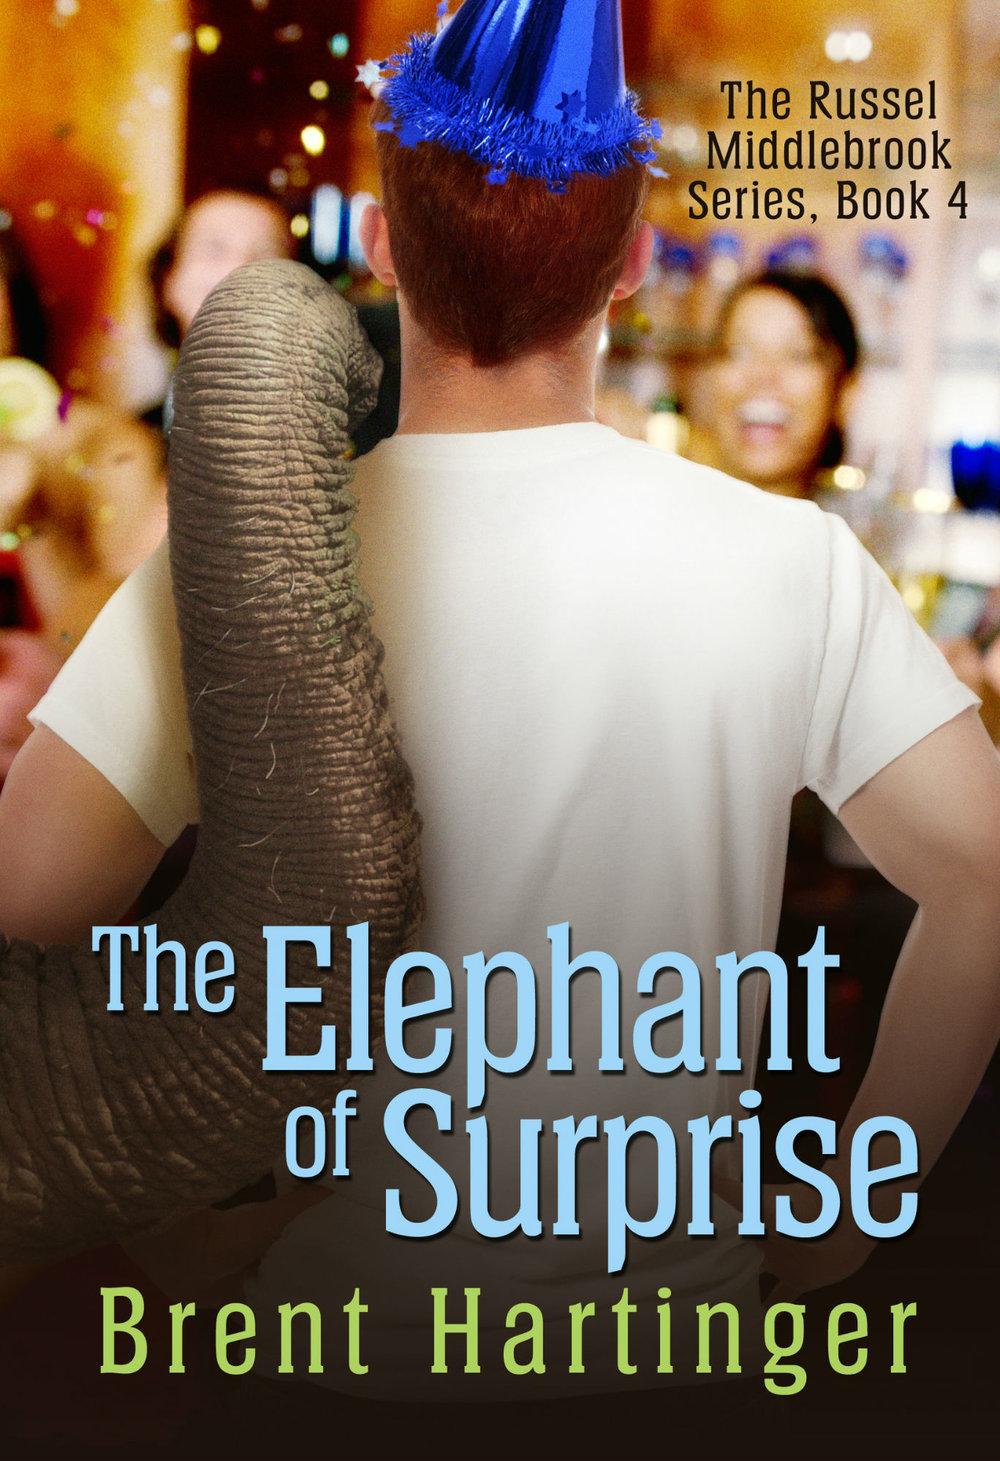 ElephantofSurpriseJacket.jpg